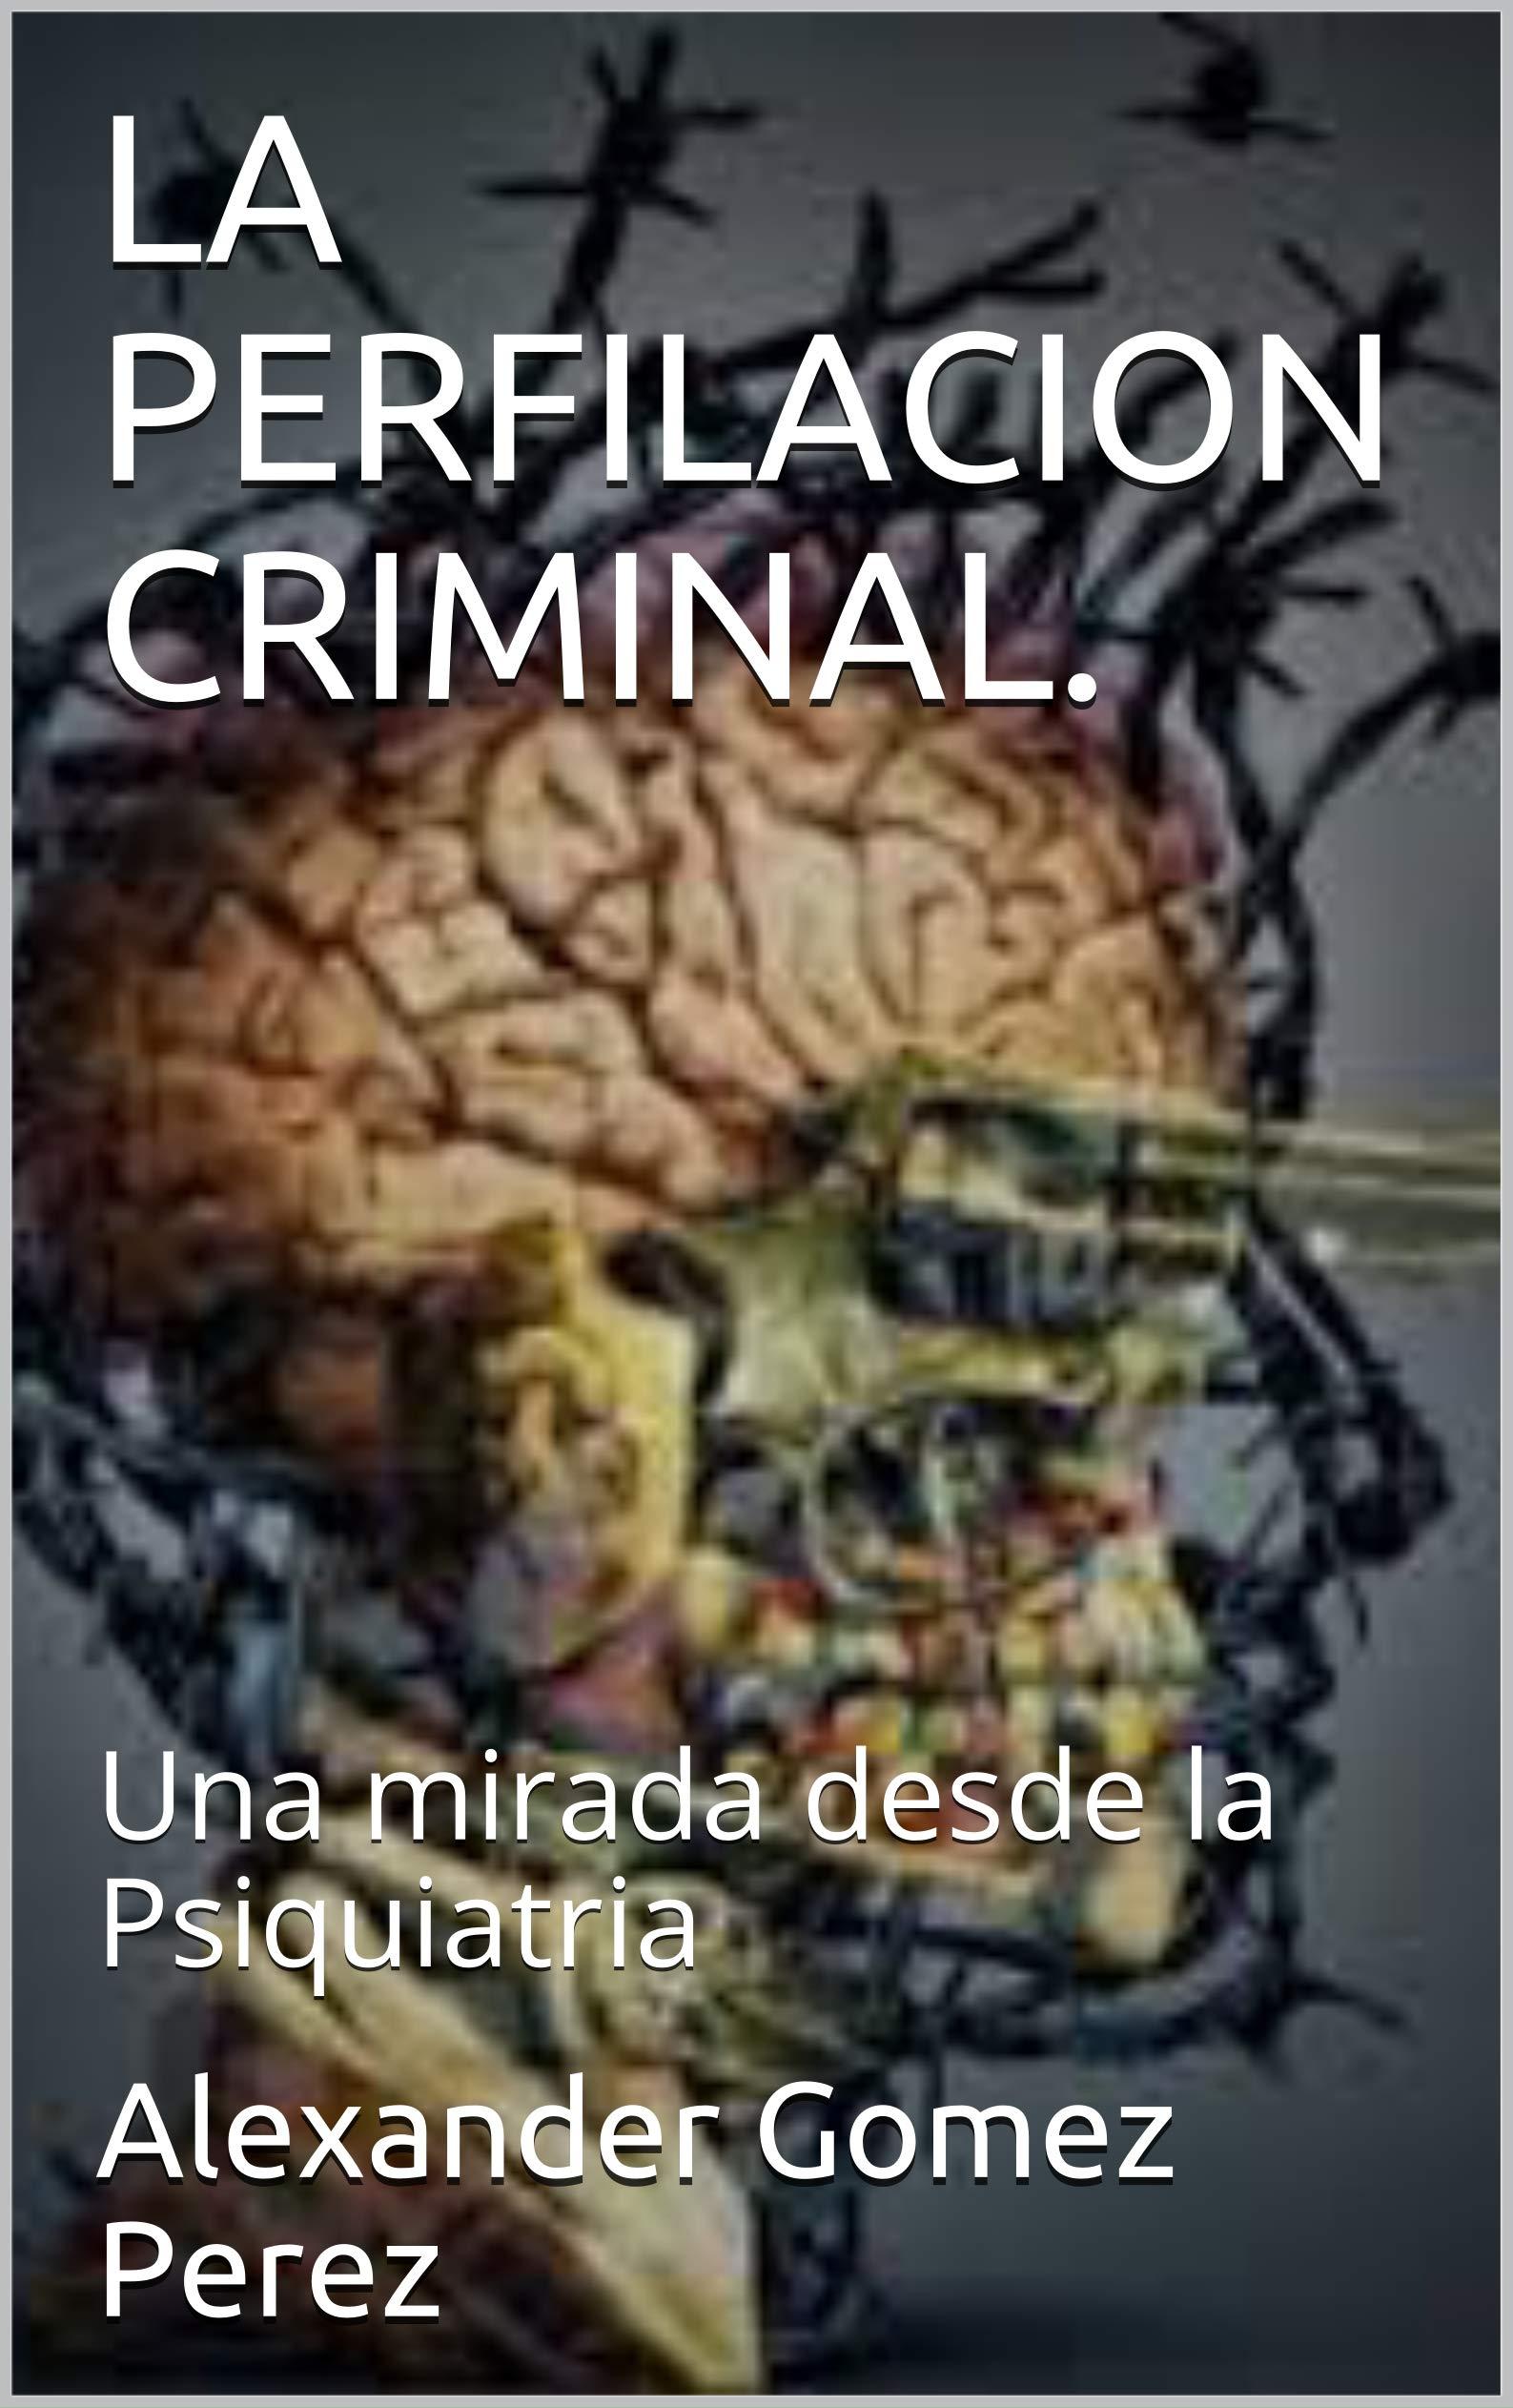 LA PERFILACION CRIMINAL.: Una mirada desde la Psiquiatria Alexander Gomez Perez, Teresa Gracia